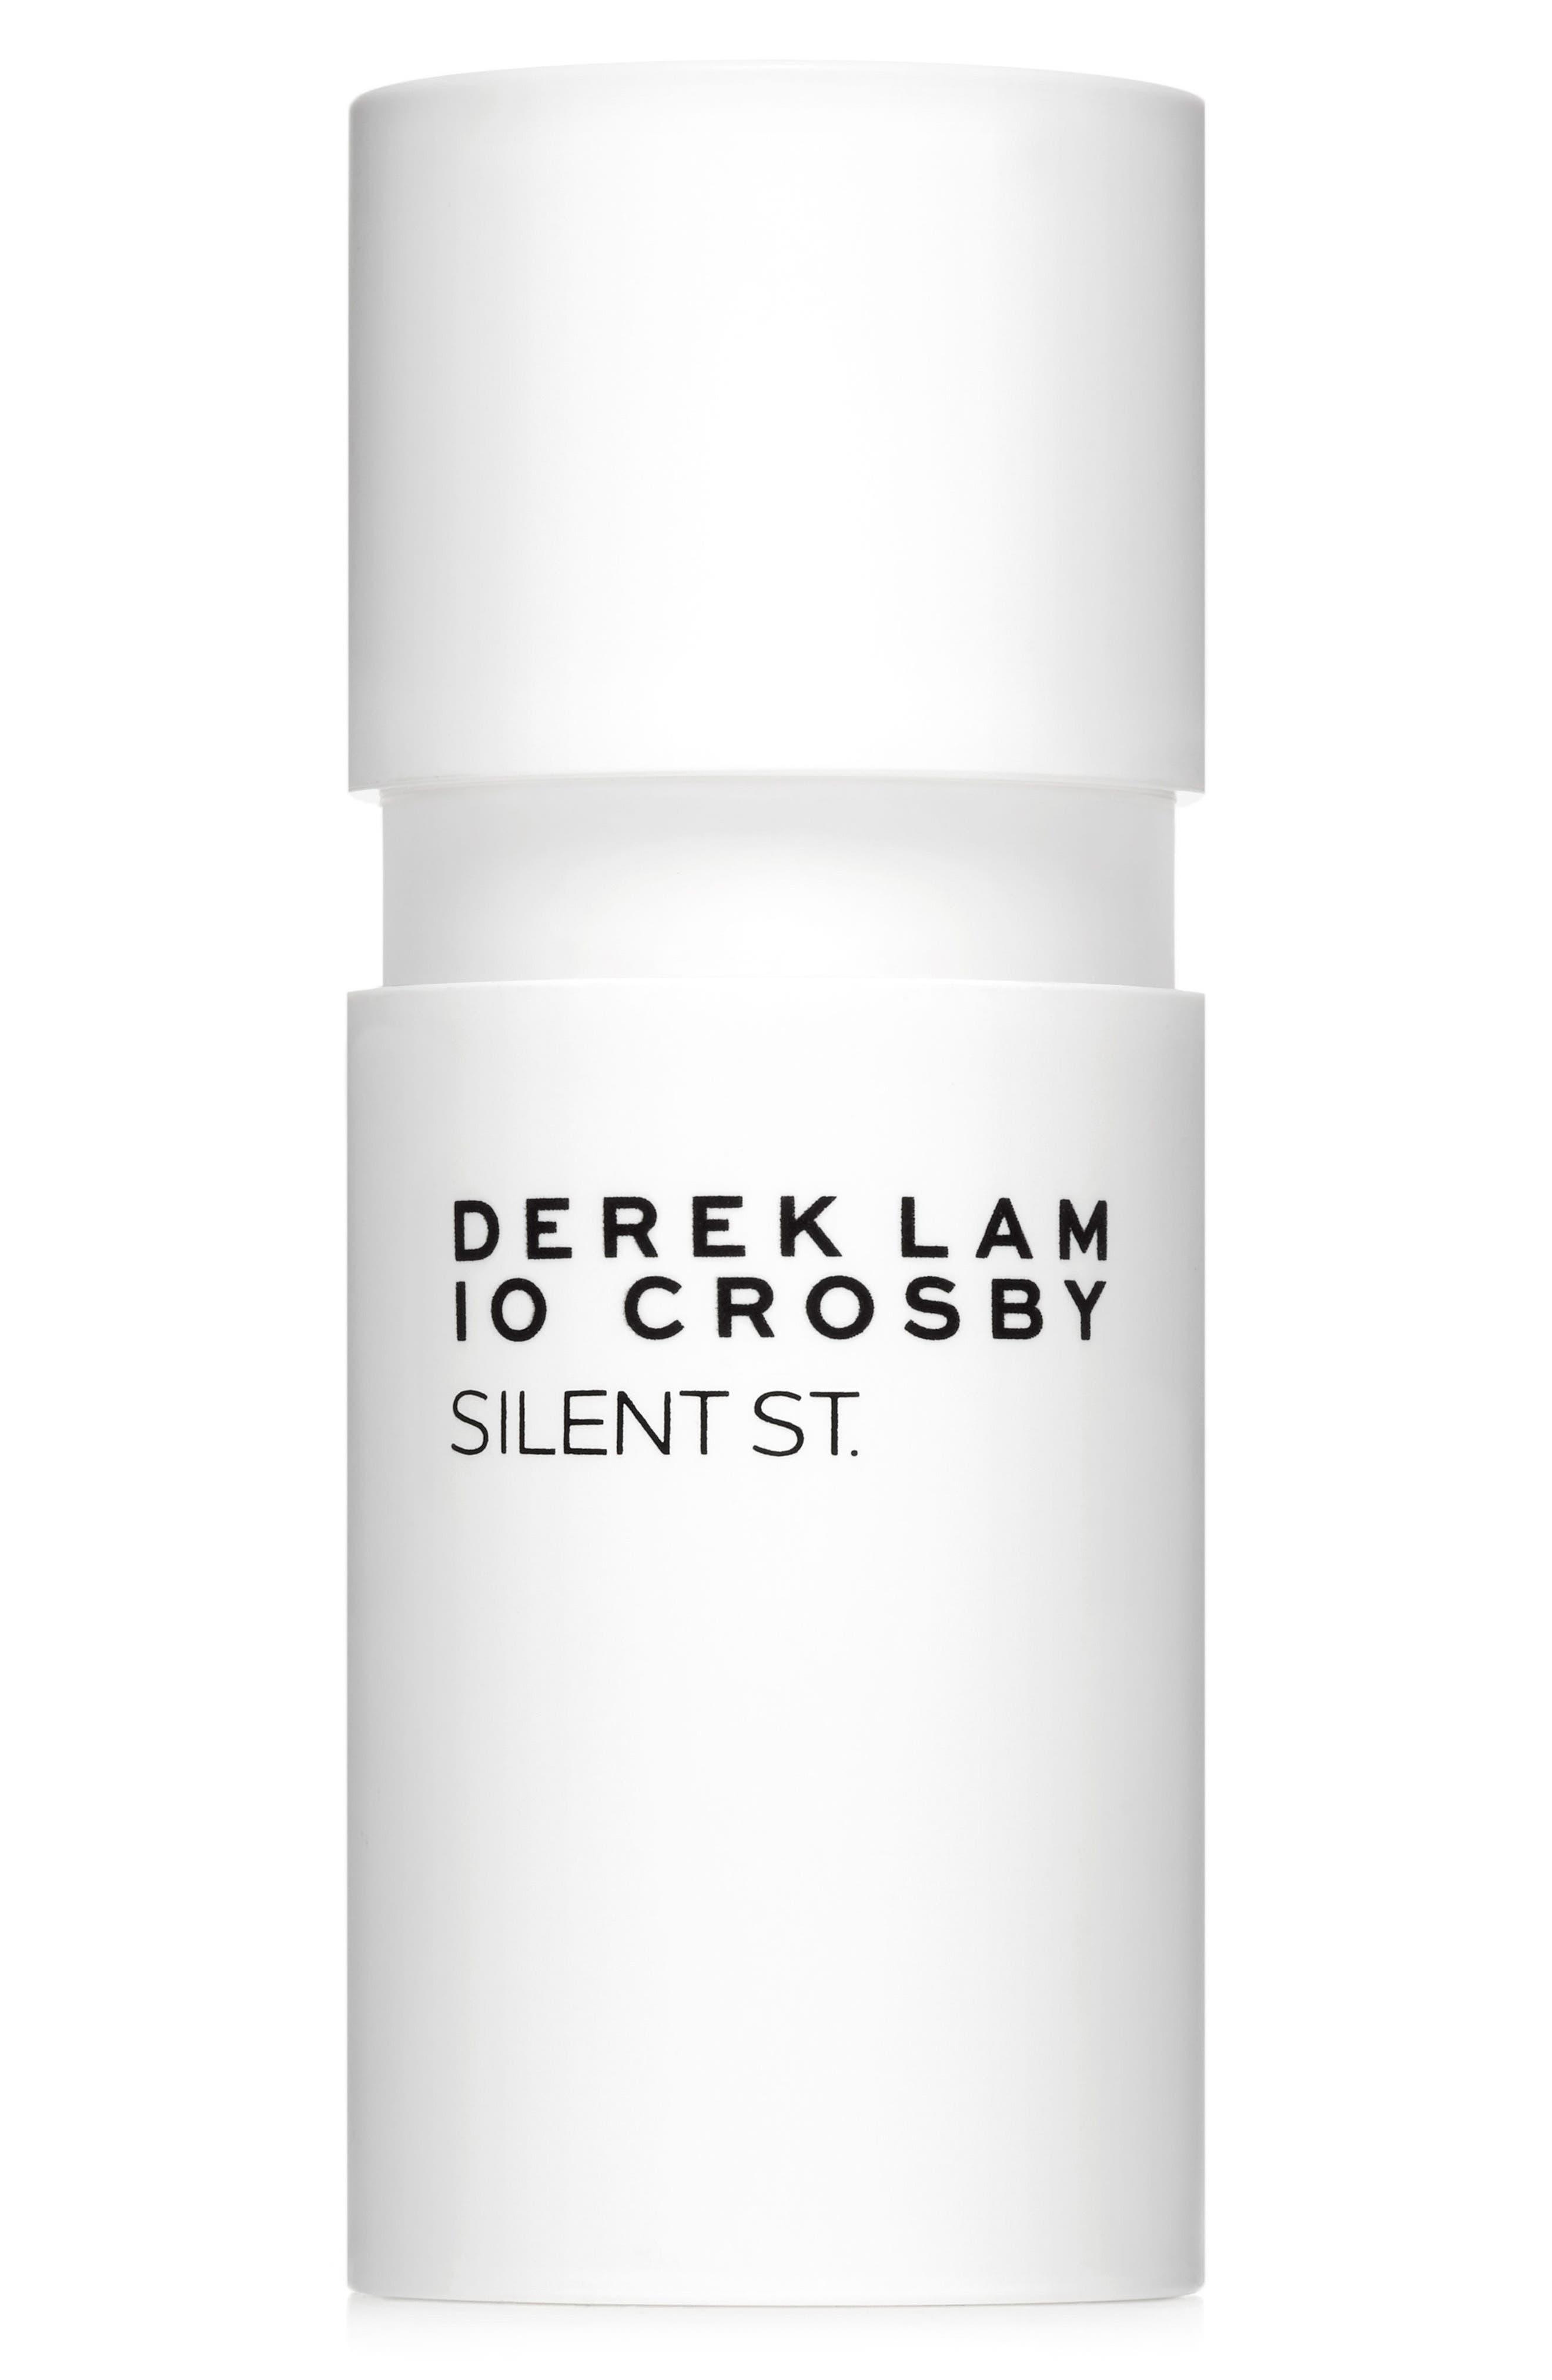 Silent Street Parfum Stick,                             Main thumbnail 1, color,                             000